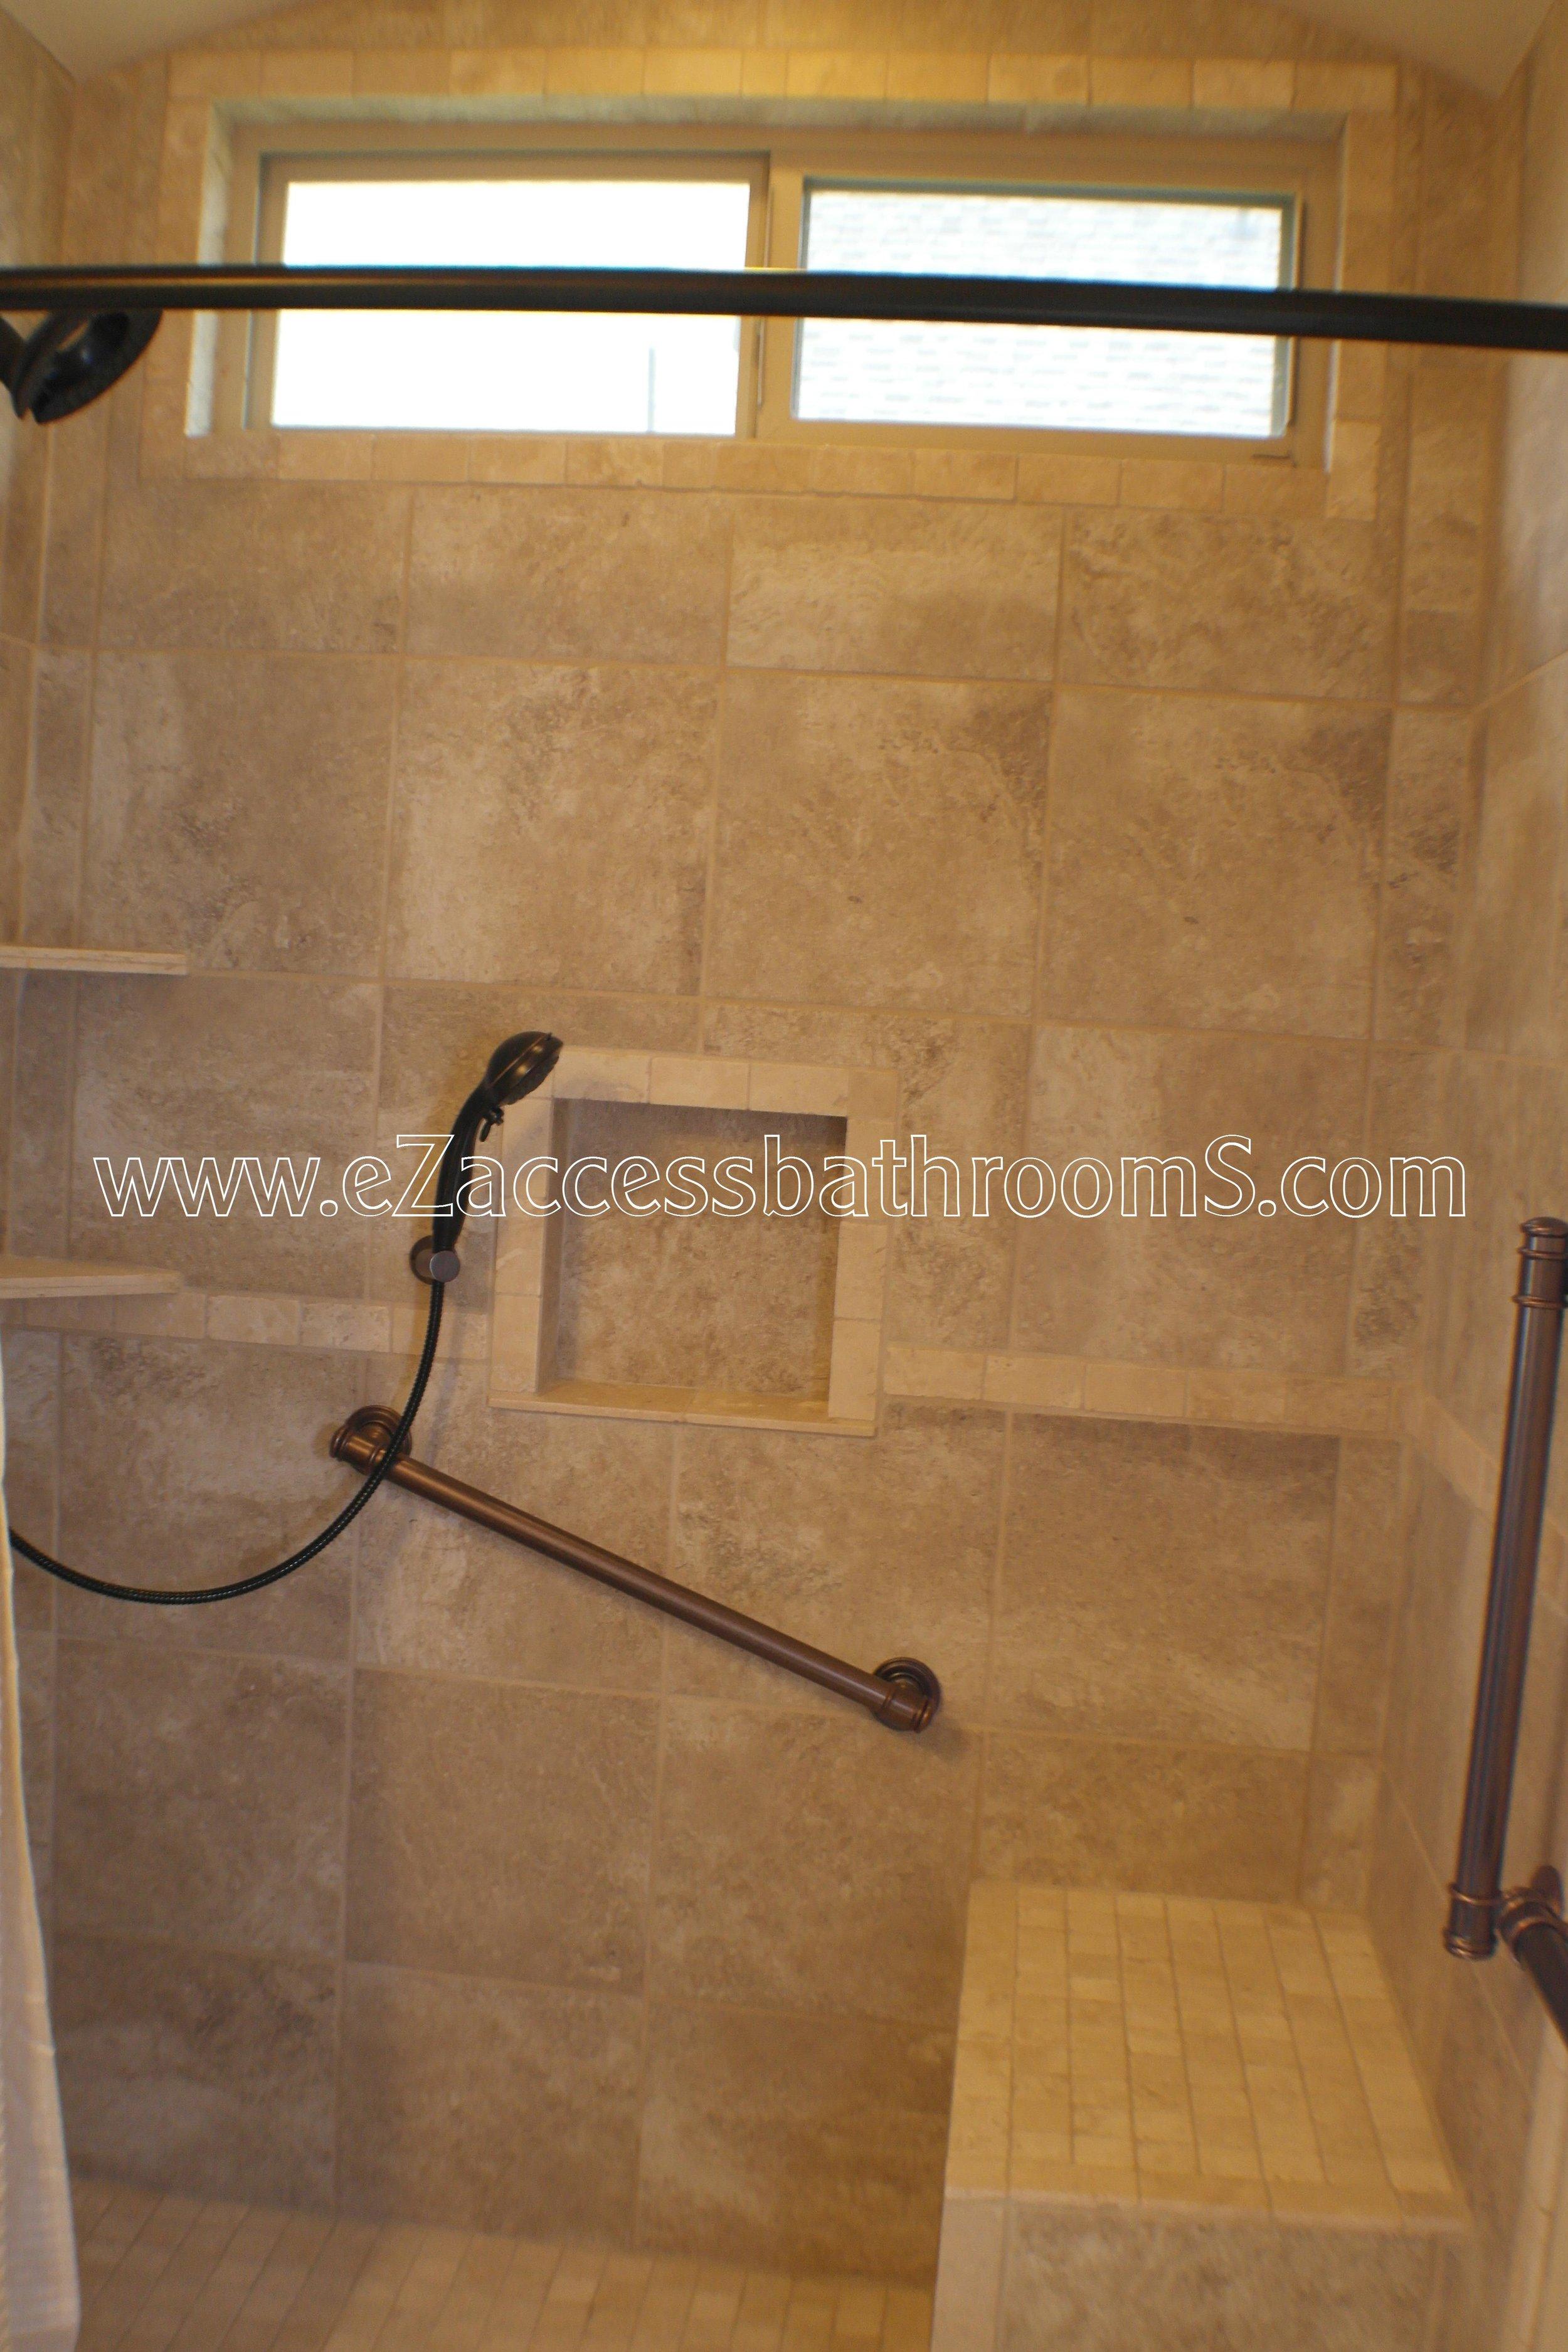 walk-in showers houston ezaccessbathrooms.com 832.202.8453 johnston 078.JPG